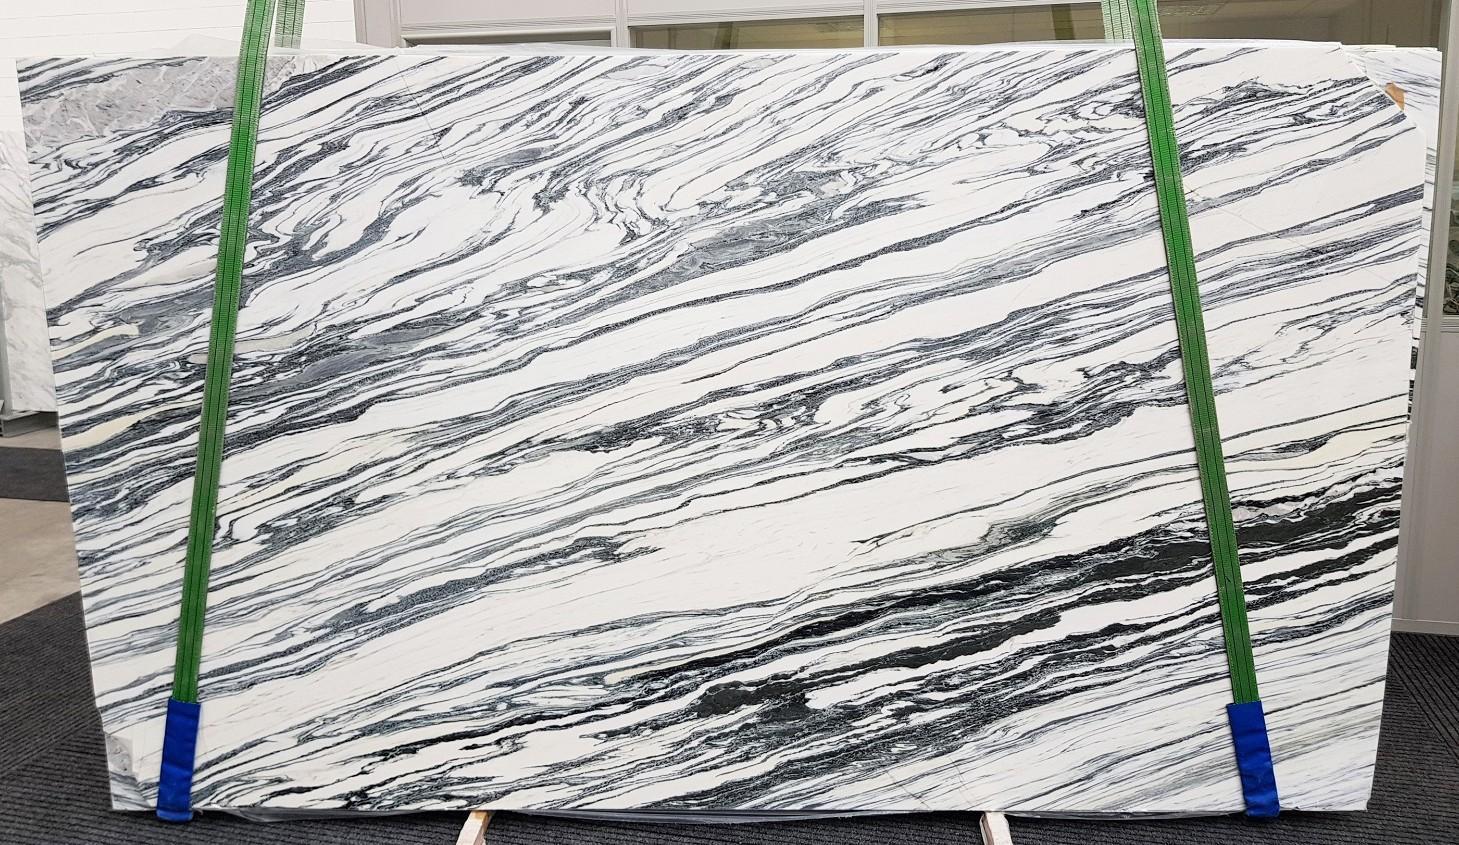 FANTASTICO ARNI VENATO polished slabs 1058 , Slab #17 natural marble